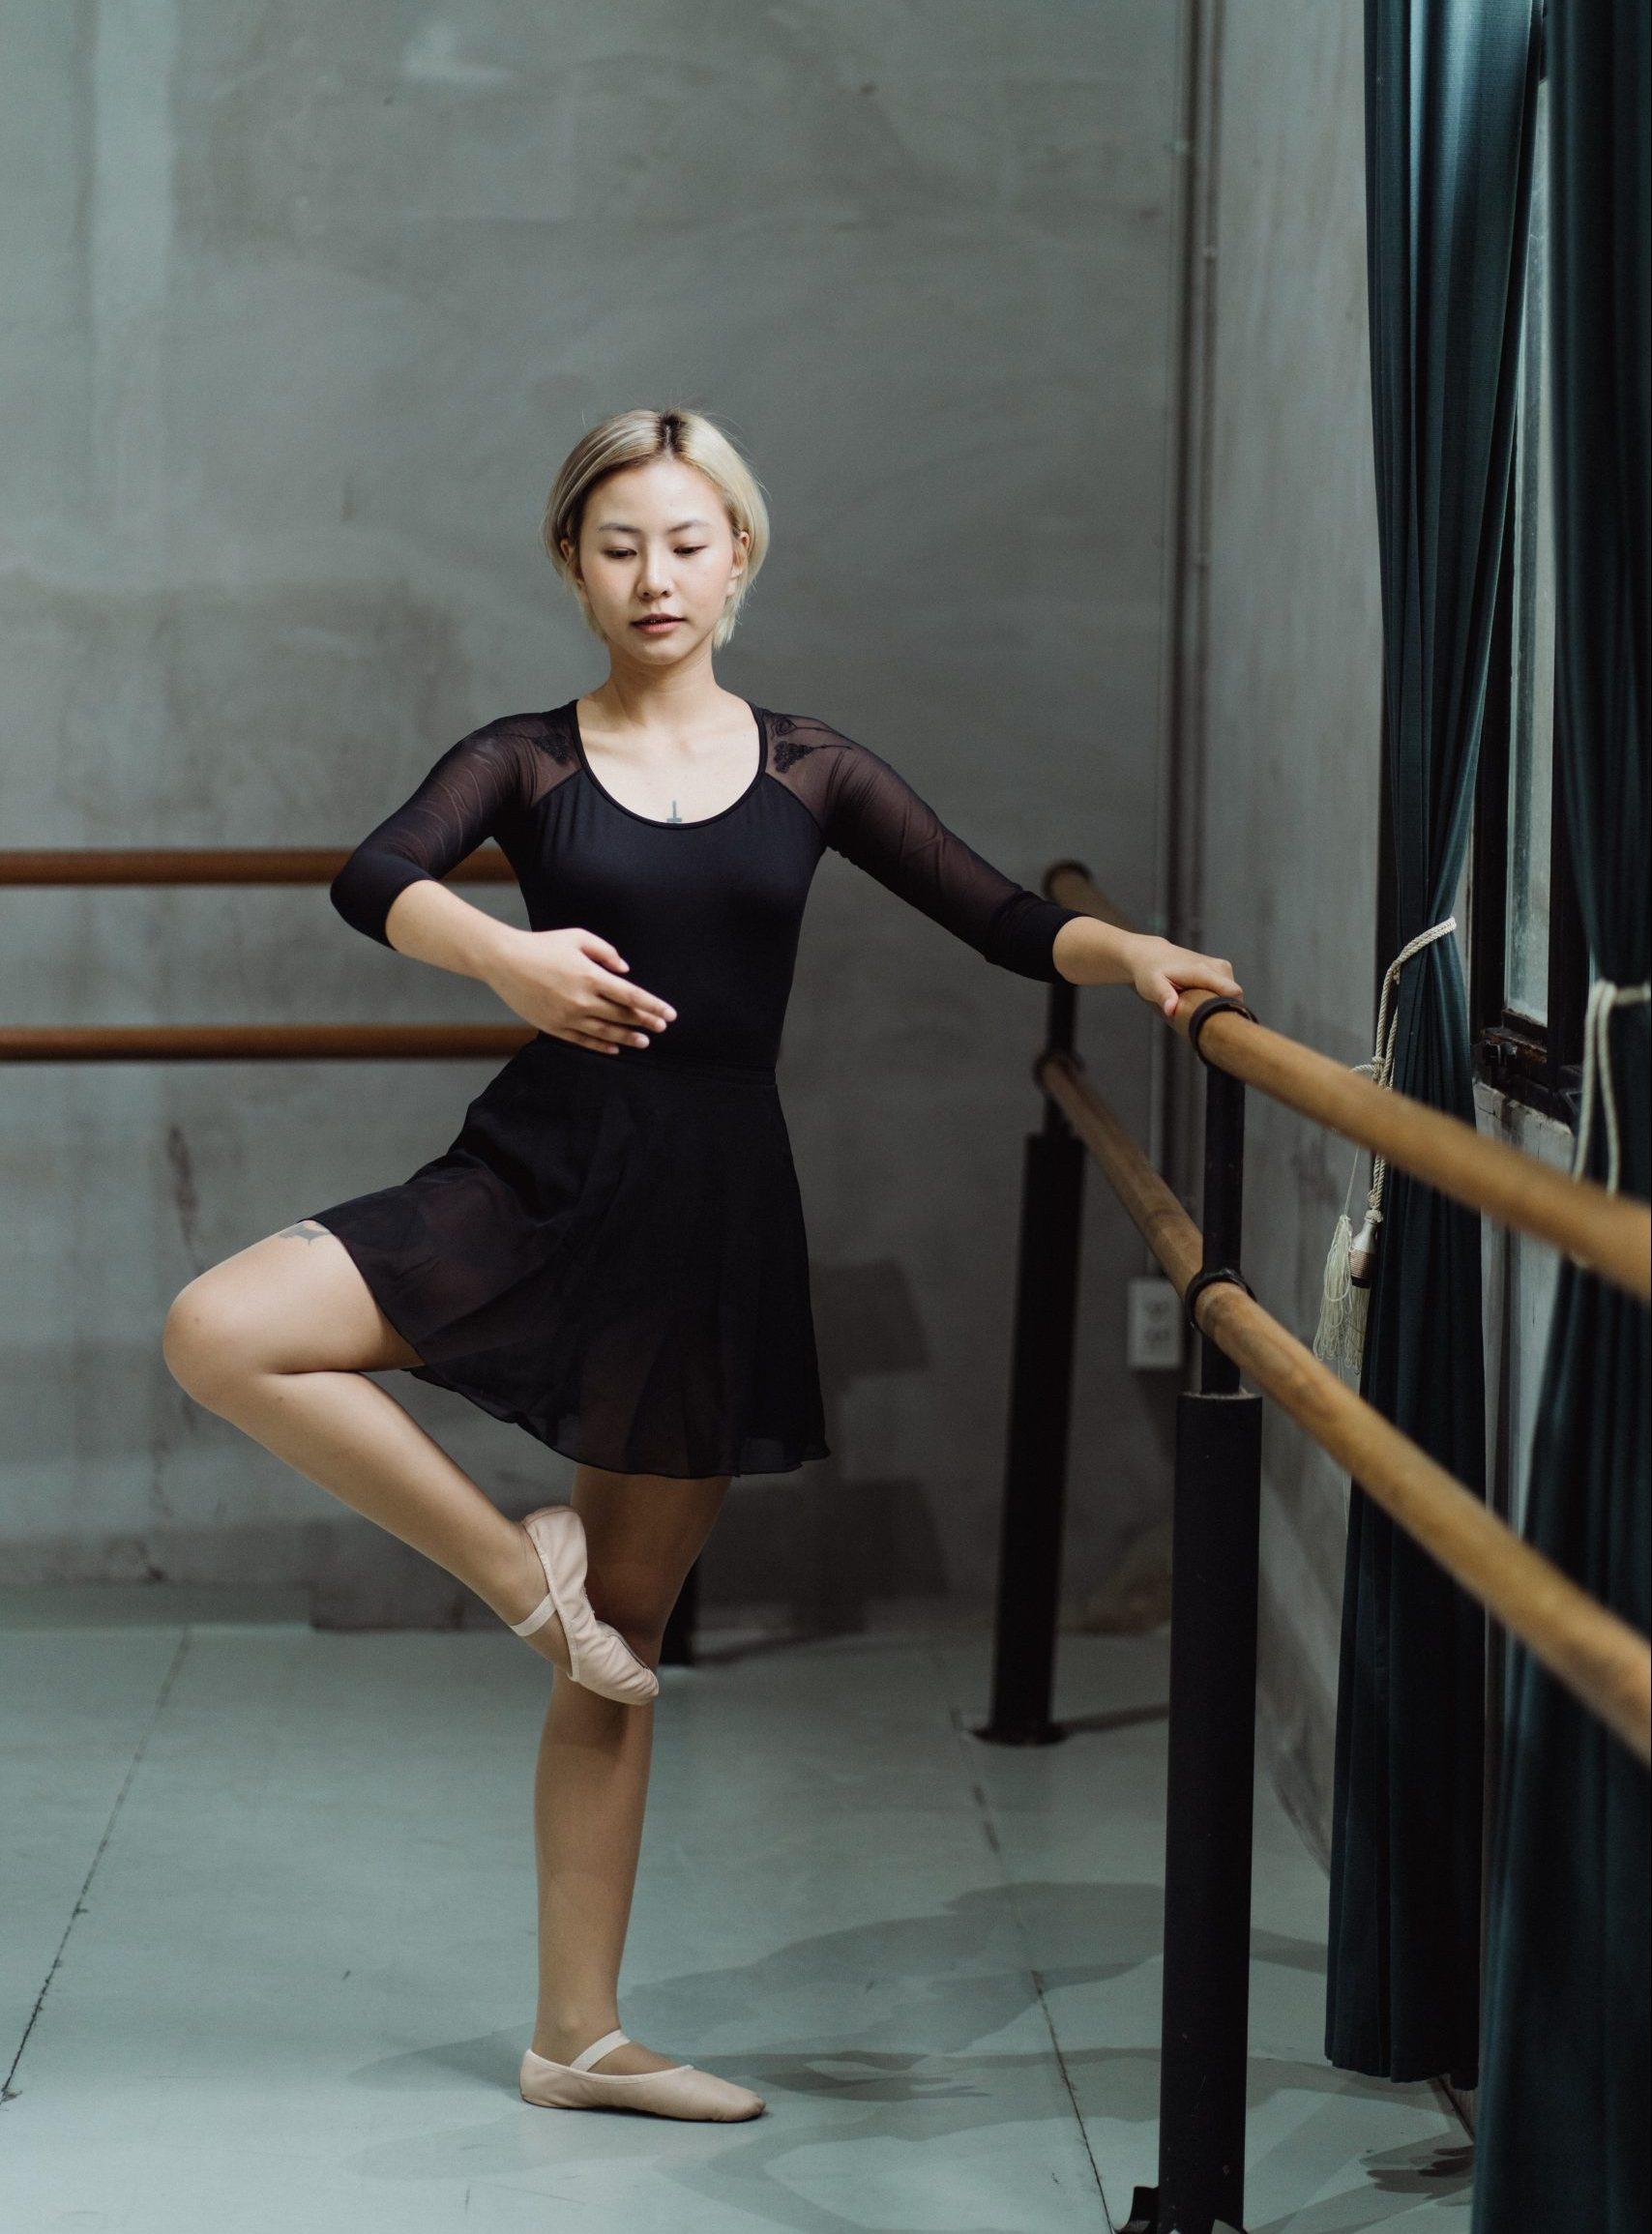 adagio balletles oefening eruit